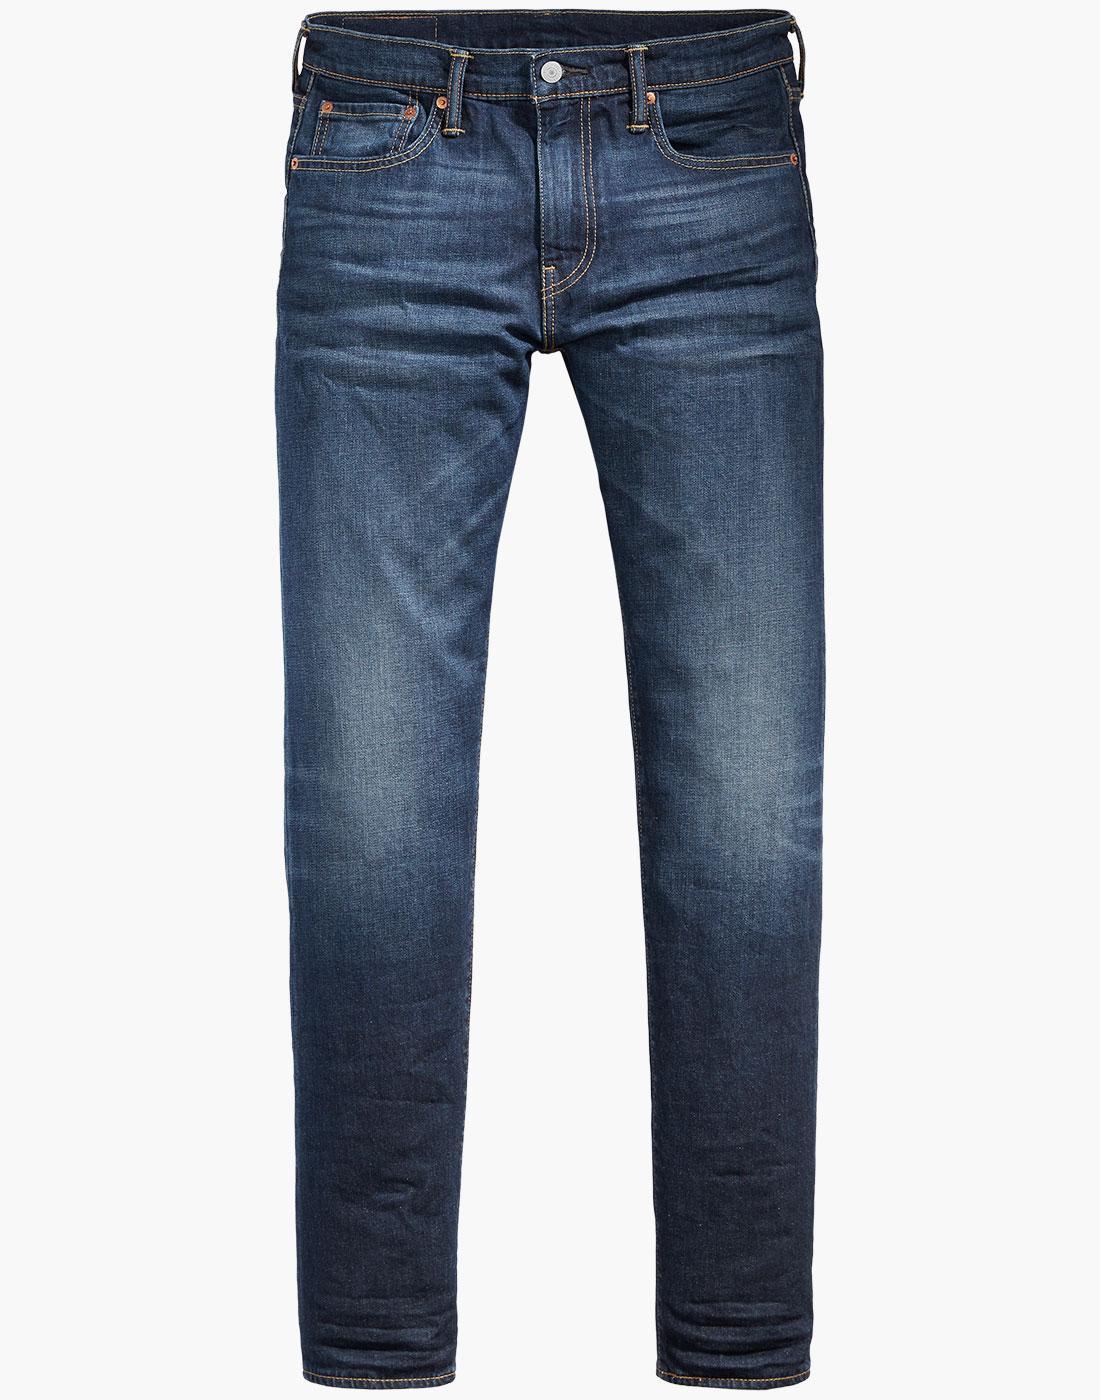 LEVI'S 502 Regular Tapered Denim Jeans CITY PARK